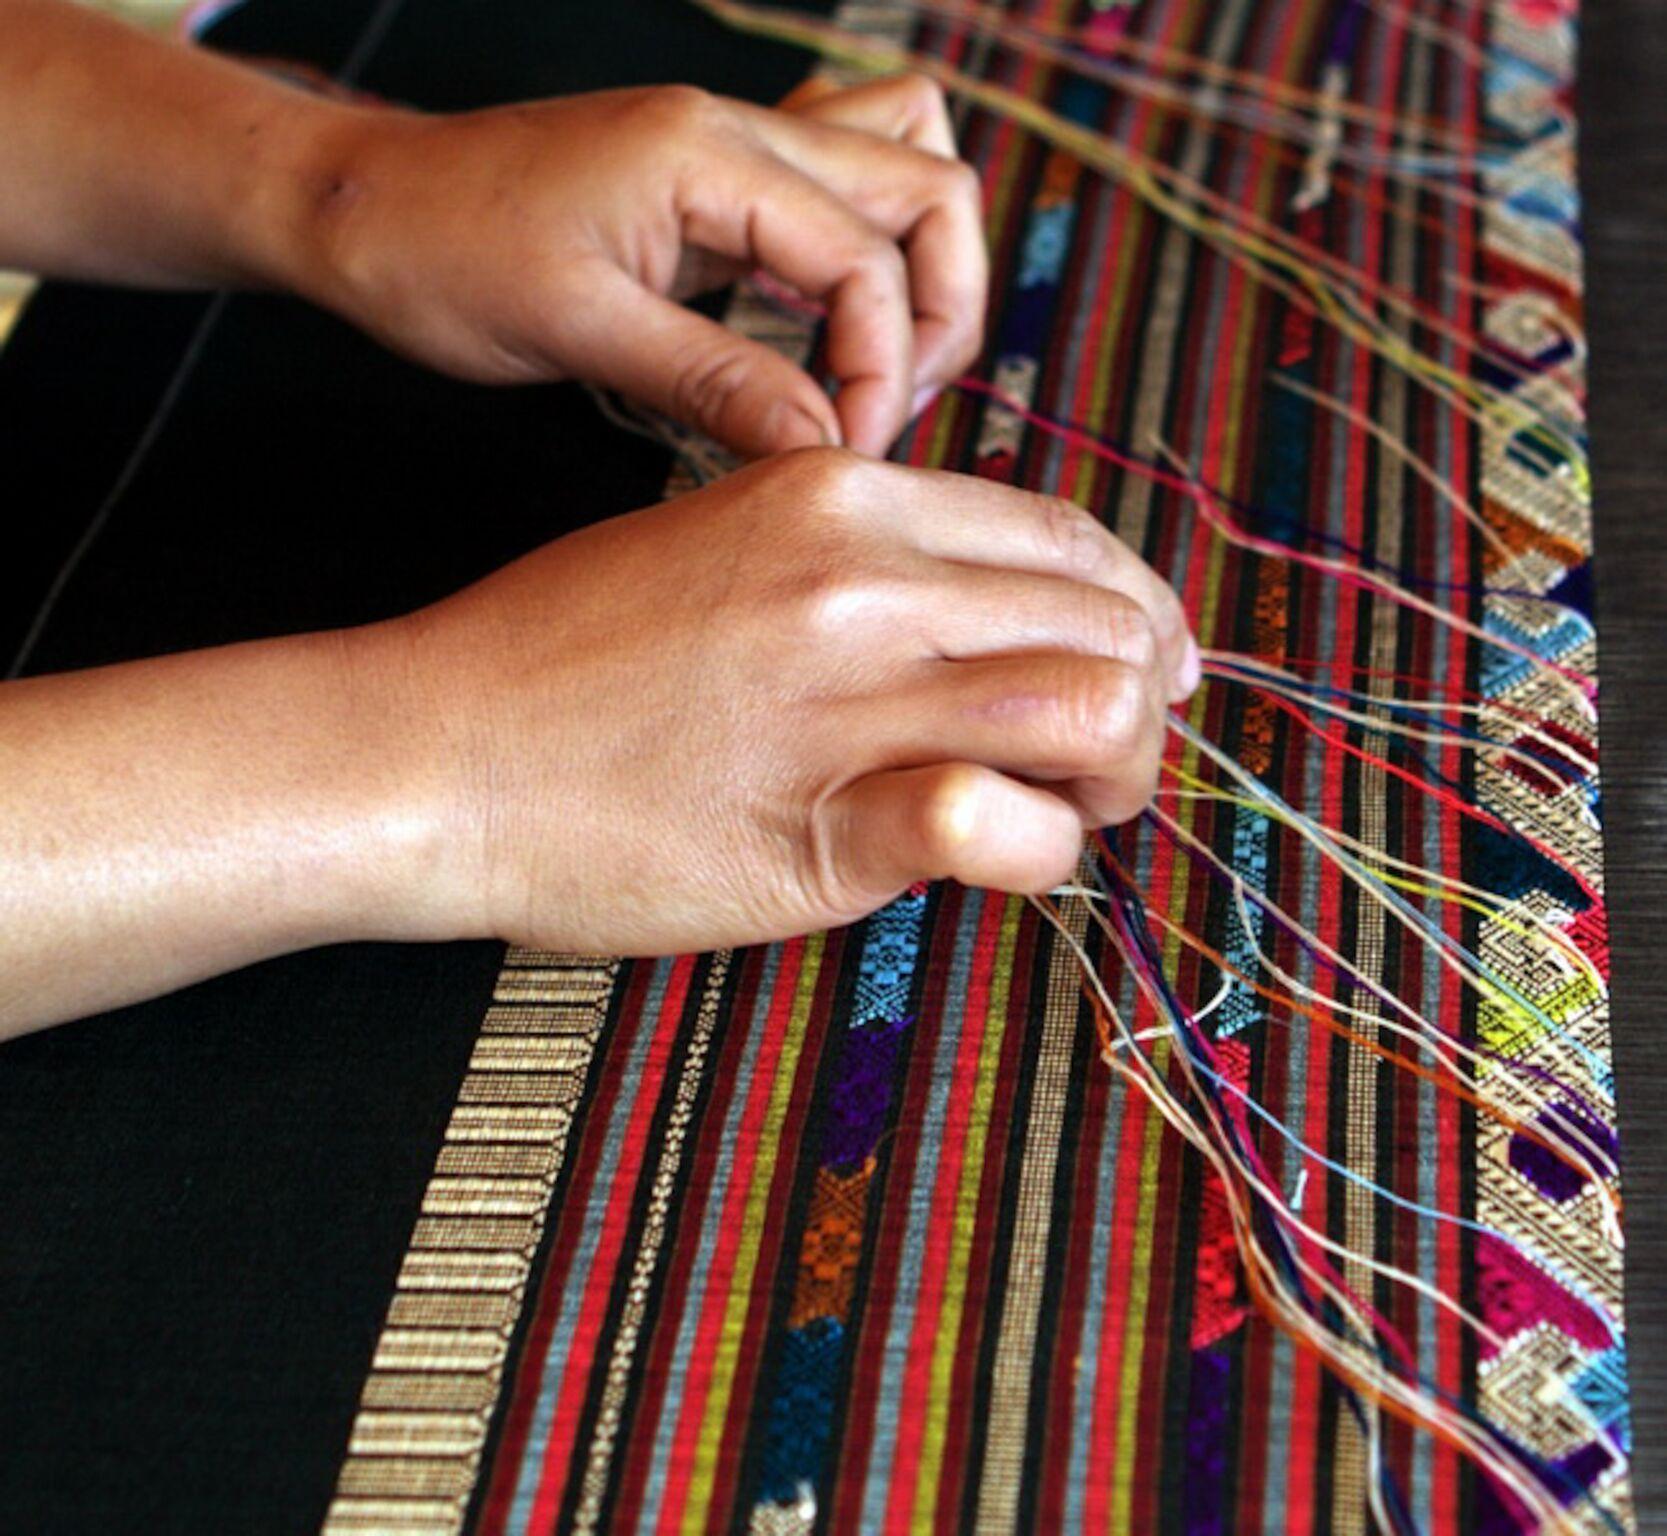 Textile weaving in Ouy Chau